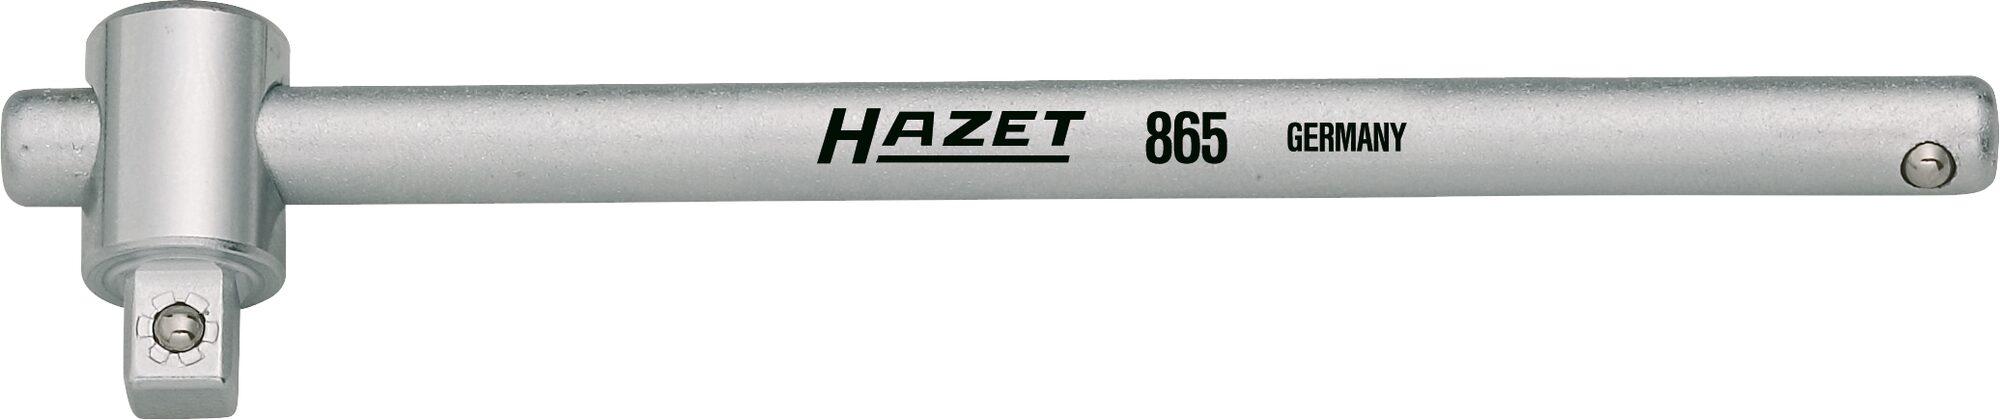 HAZET Quergriff 865 ∙ Vierkant massiv 6,3 mm (1/4 Zoll)